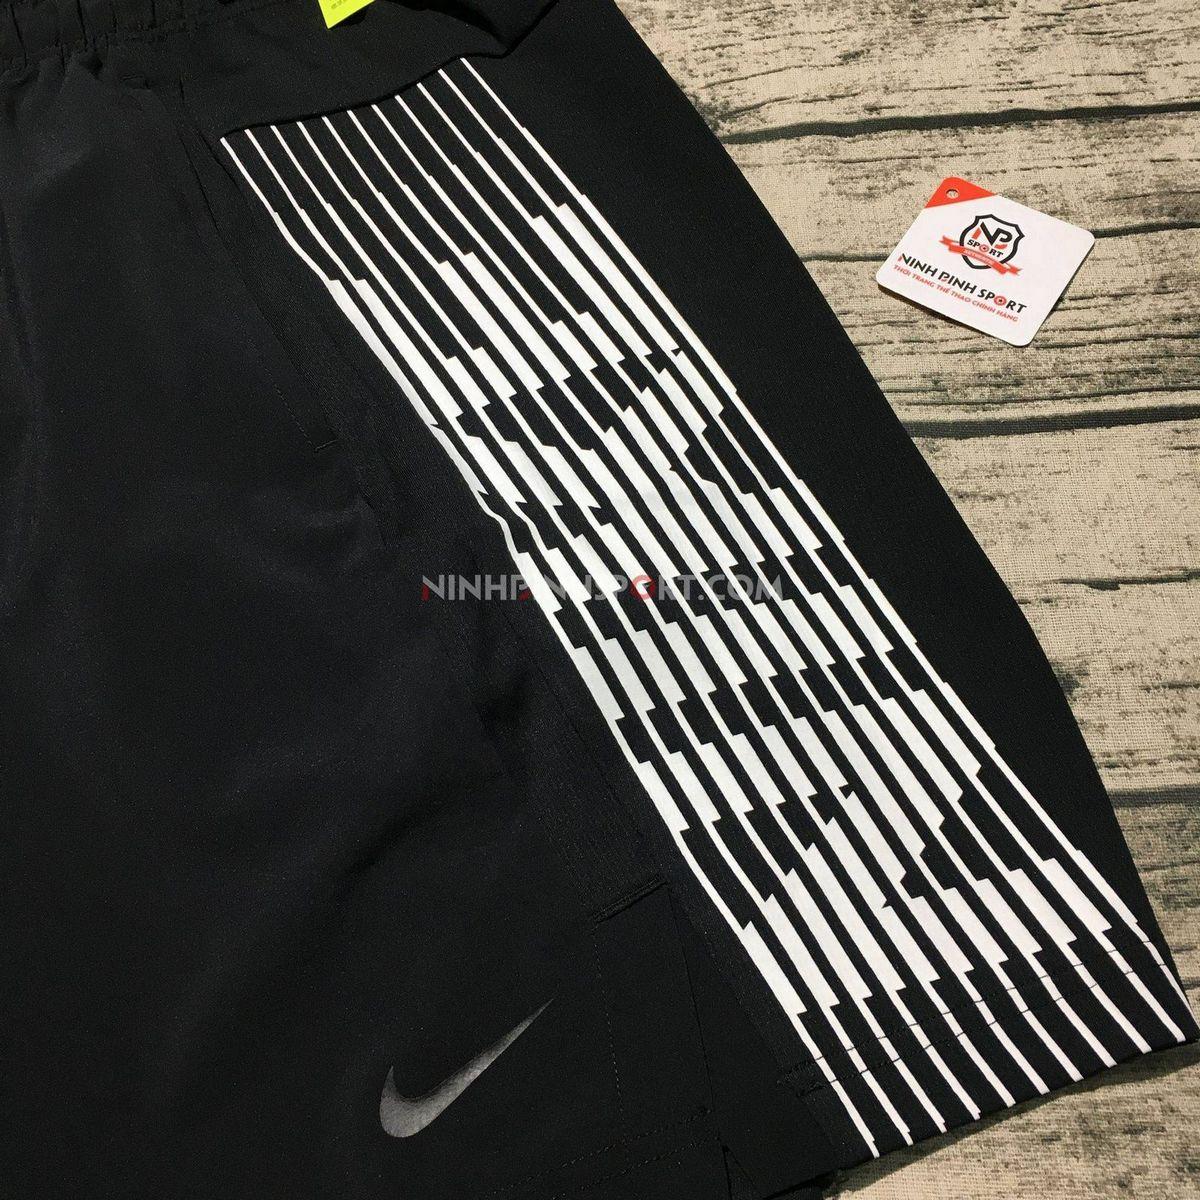 Quần thể thao nam Nike Dri-Fit Short 4.0 AQ0452-010